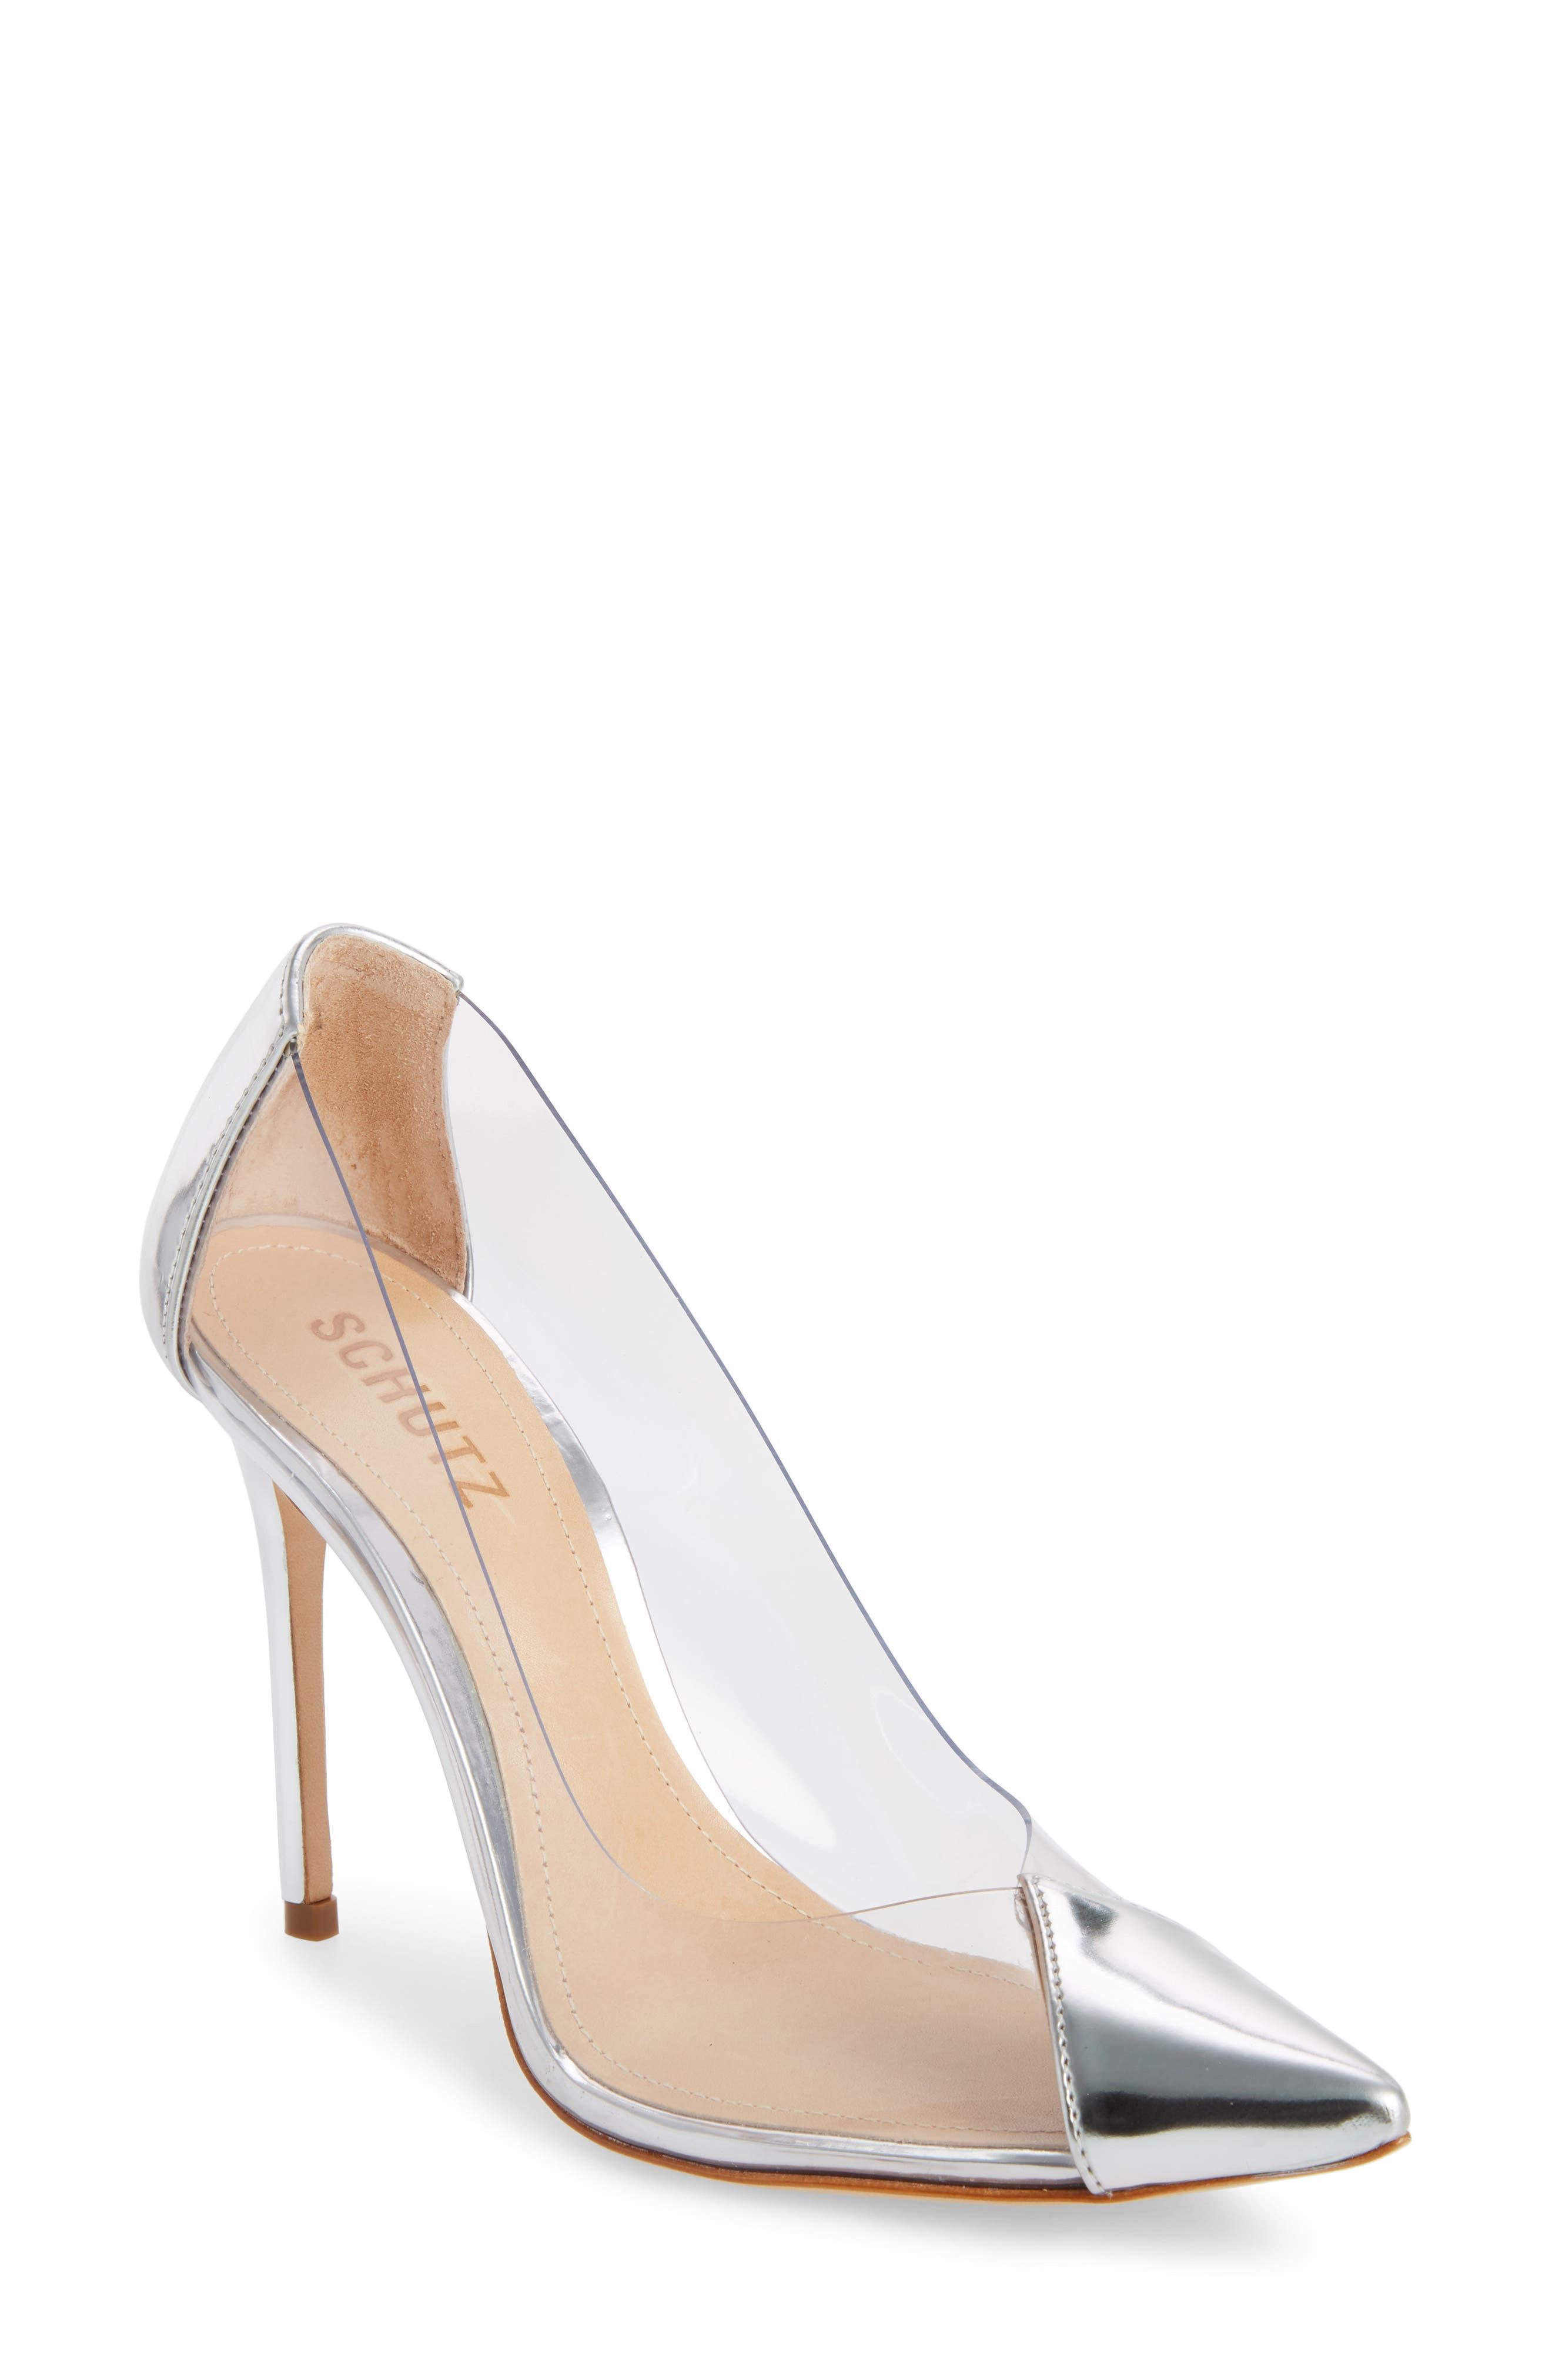 Schutz Heels, Pumps & High Heel scarpe for Donna   Nordstrom